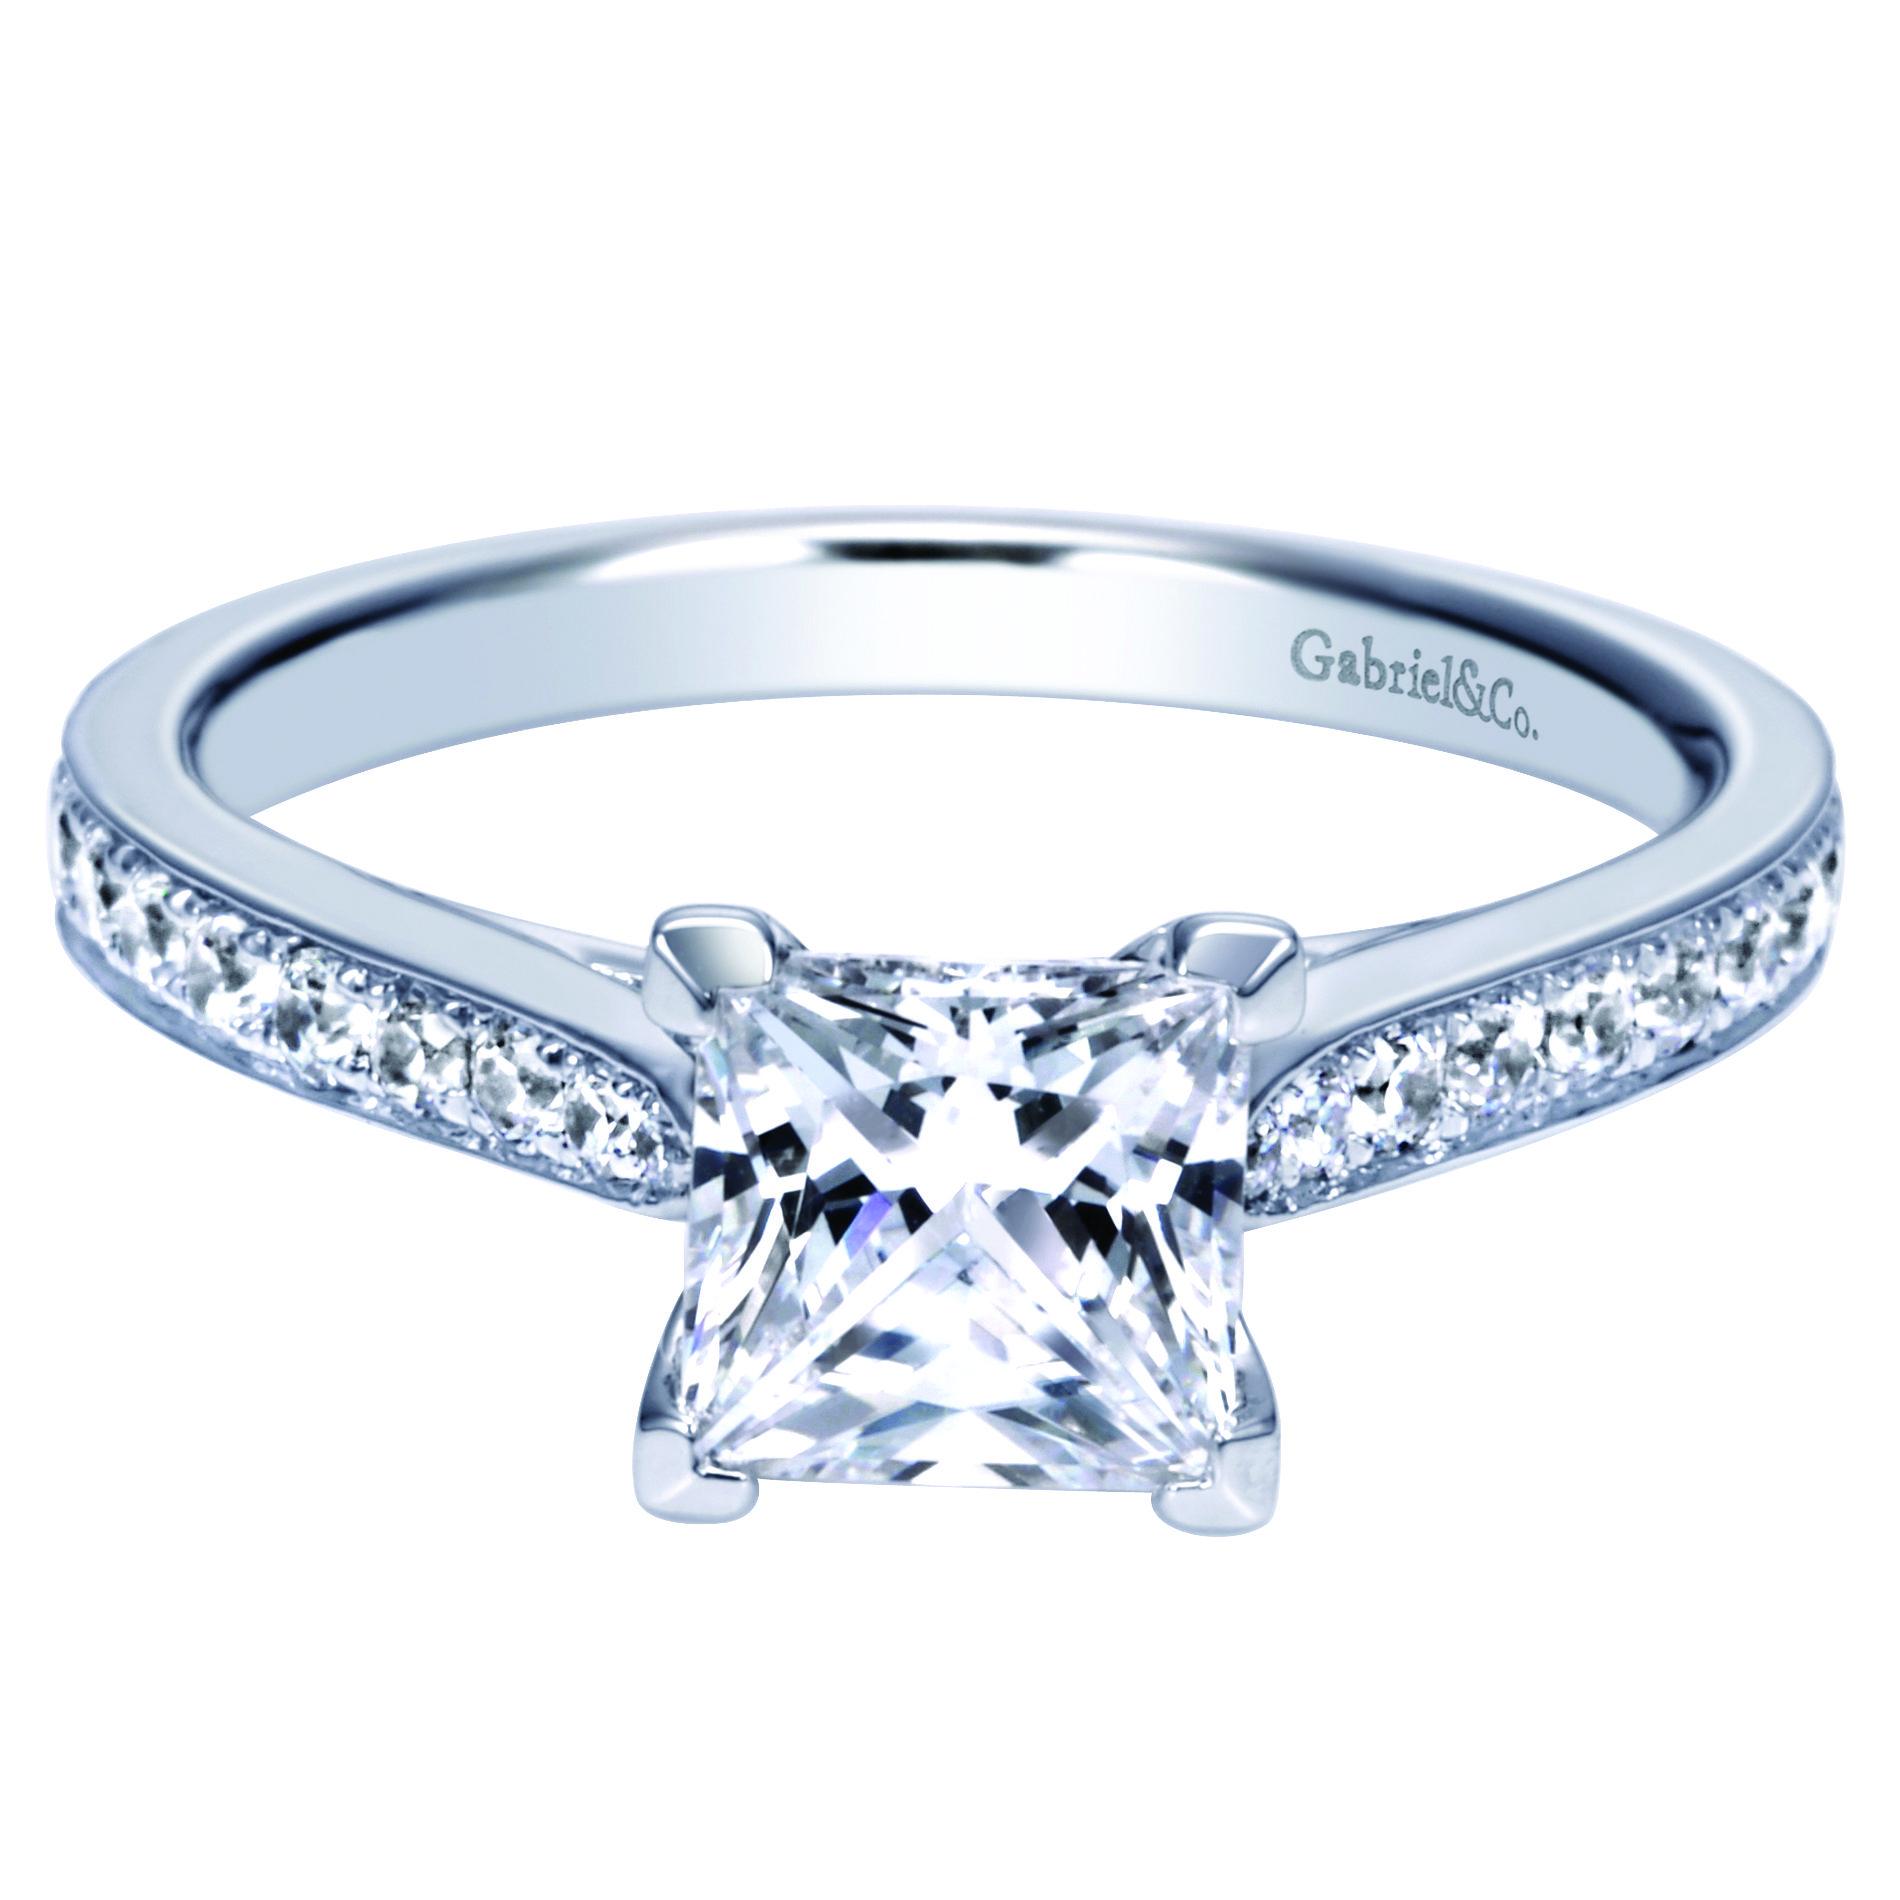 Timeless Princess Cut Diamond Engagement Ring from Steven Singer Jewelers #princesscut